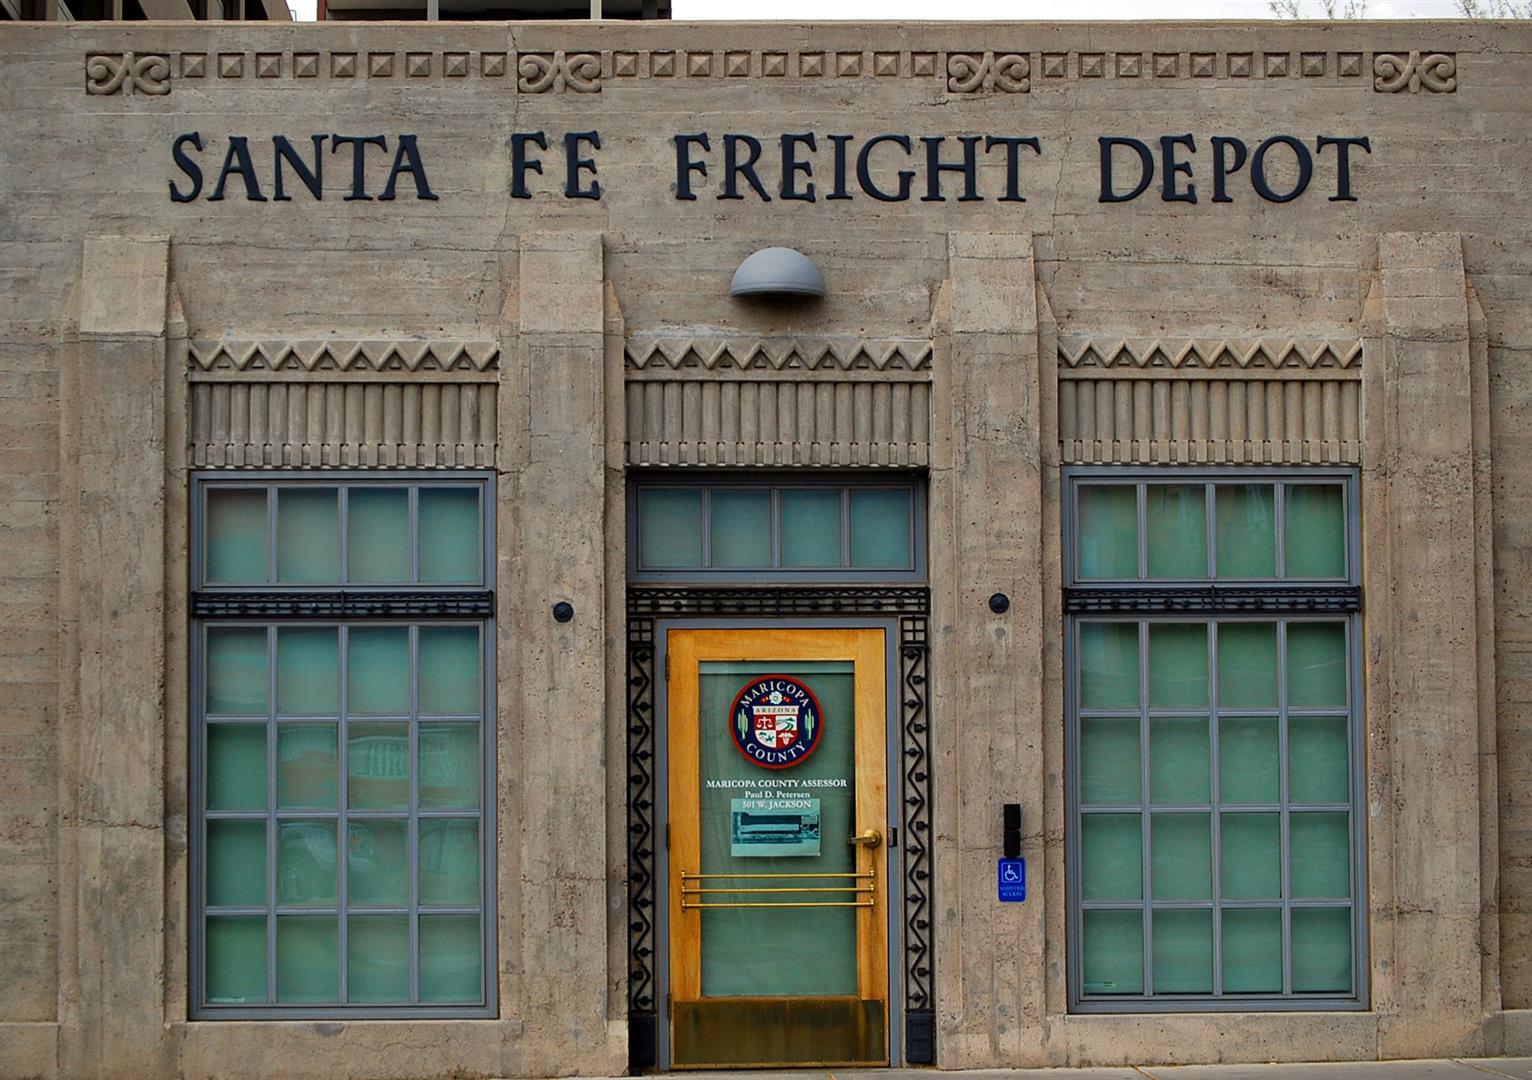 Santa Fe Freight Depot Phoenix Arizona